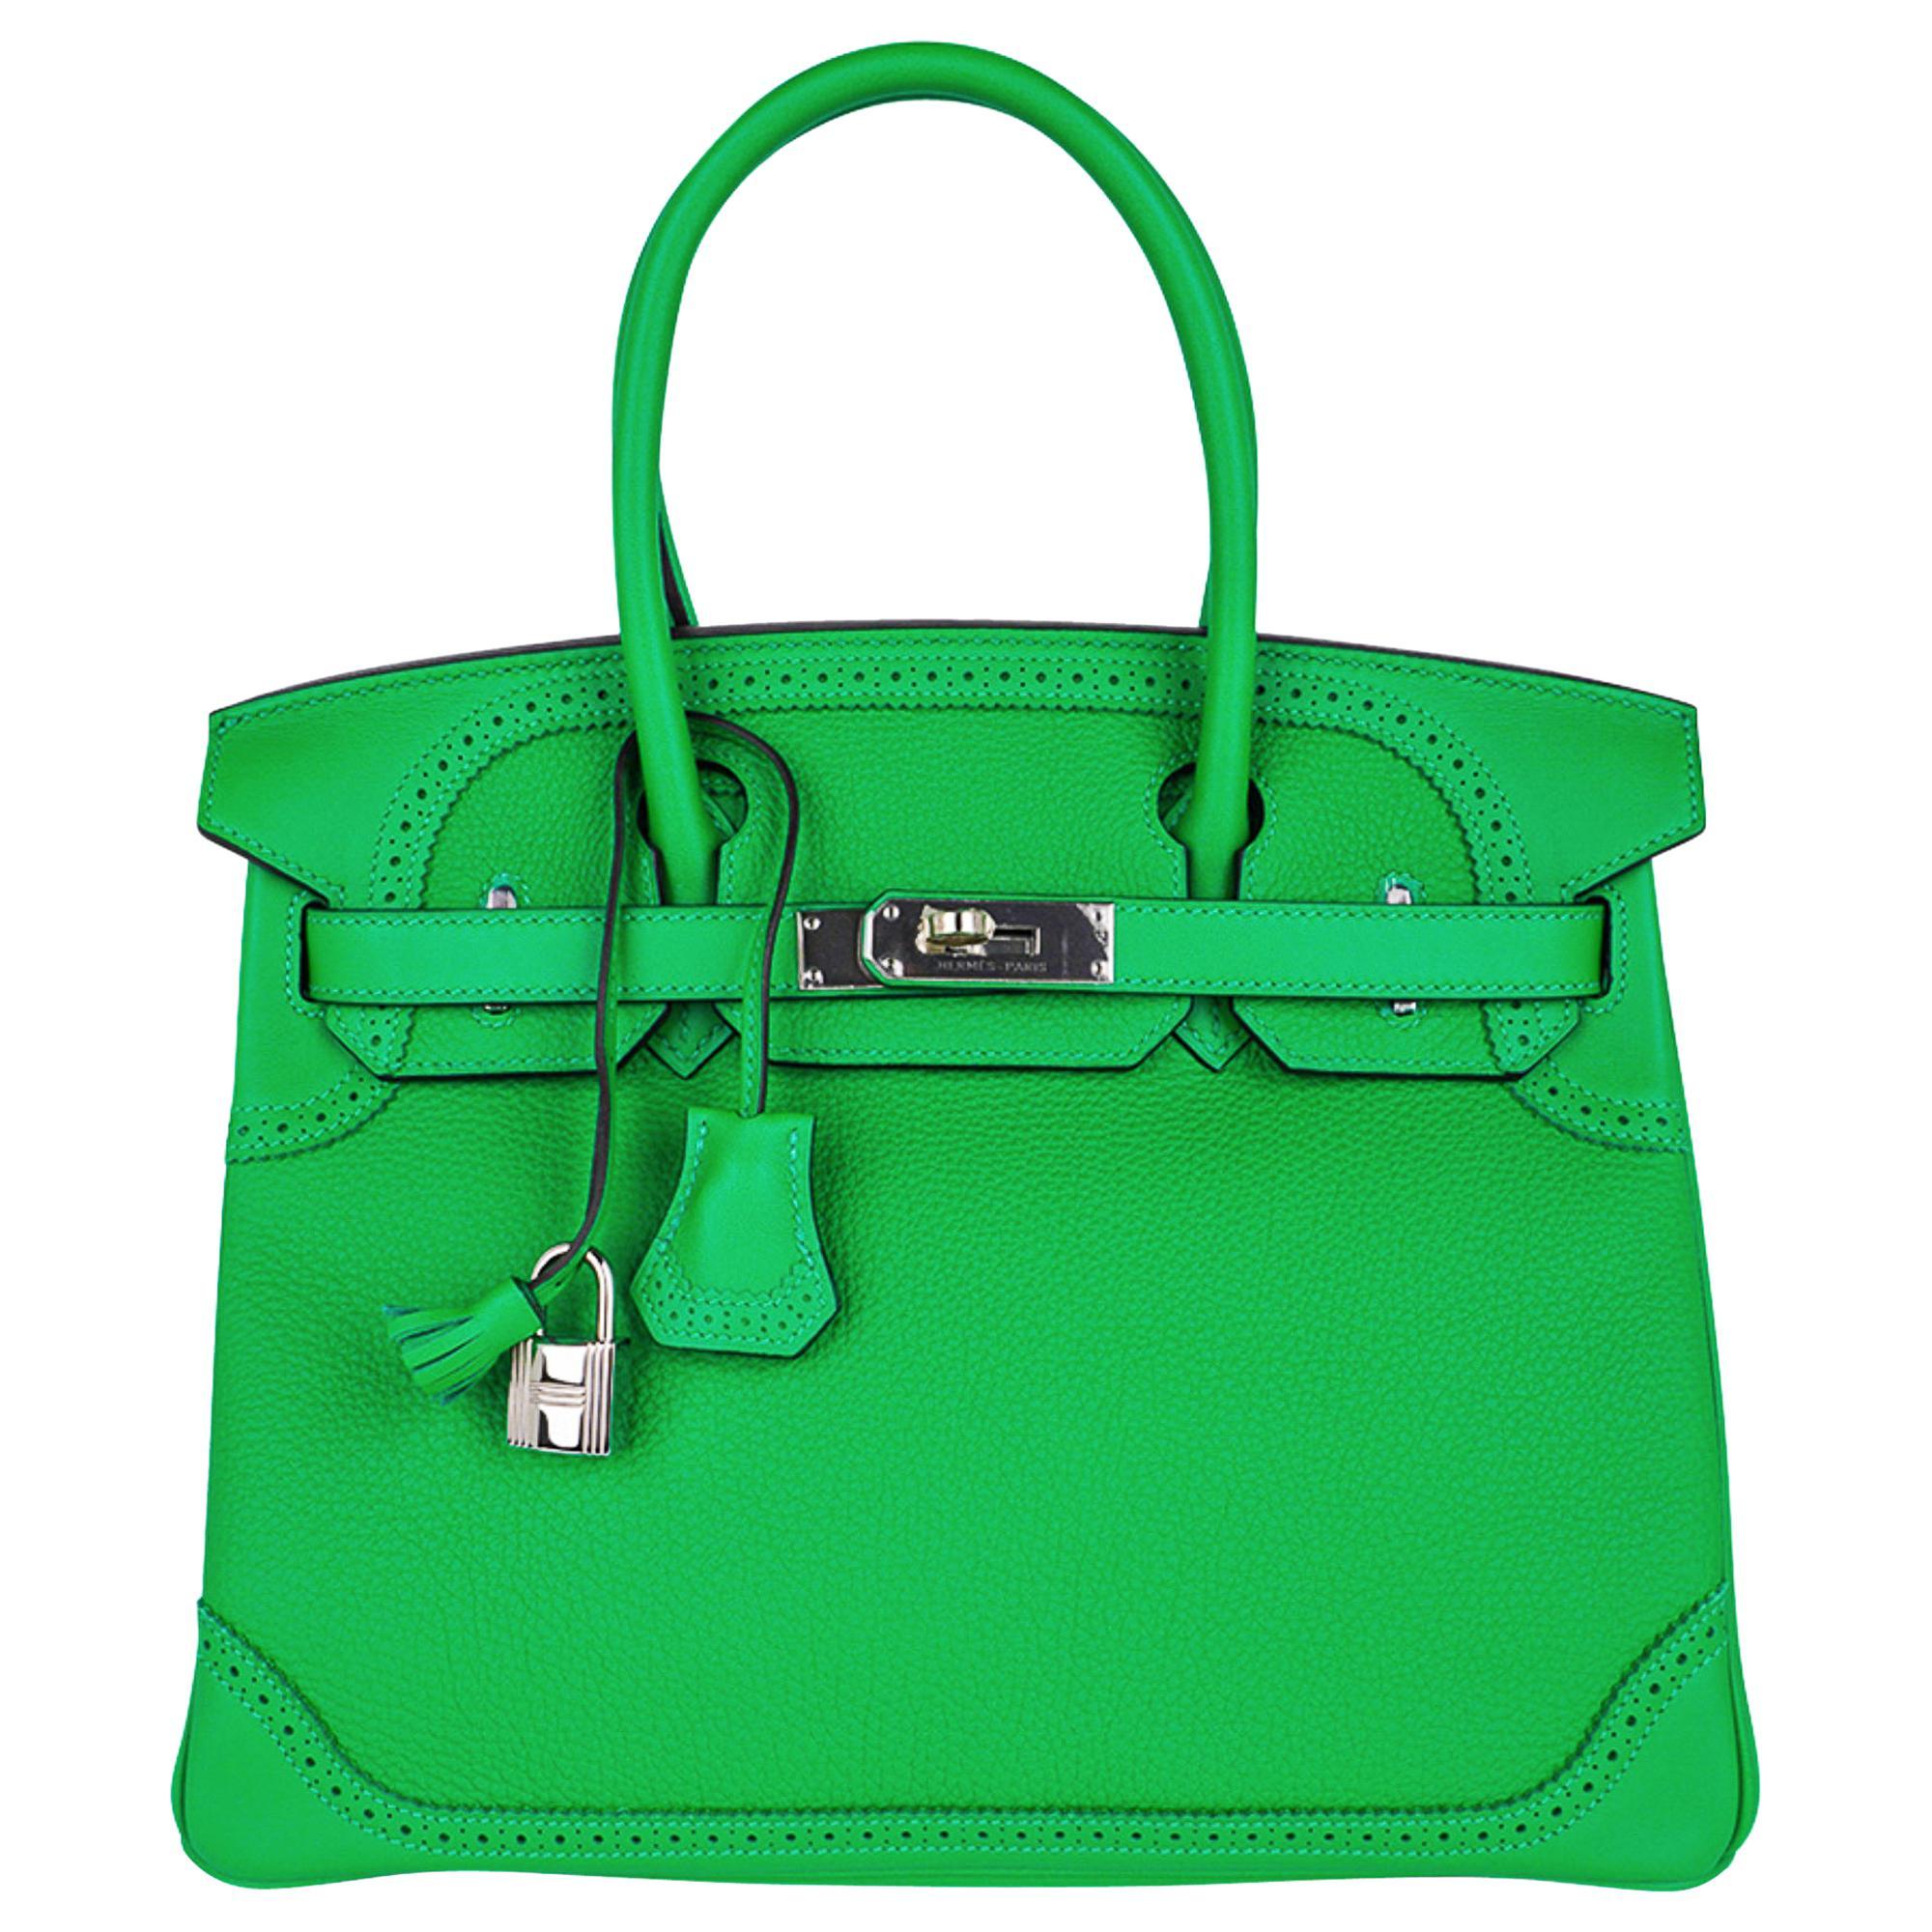 Hermes Birkin 30 Ghillies Limited Edition Bag Bamboo Palladium Hardware New w/Bo